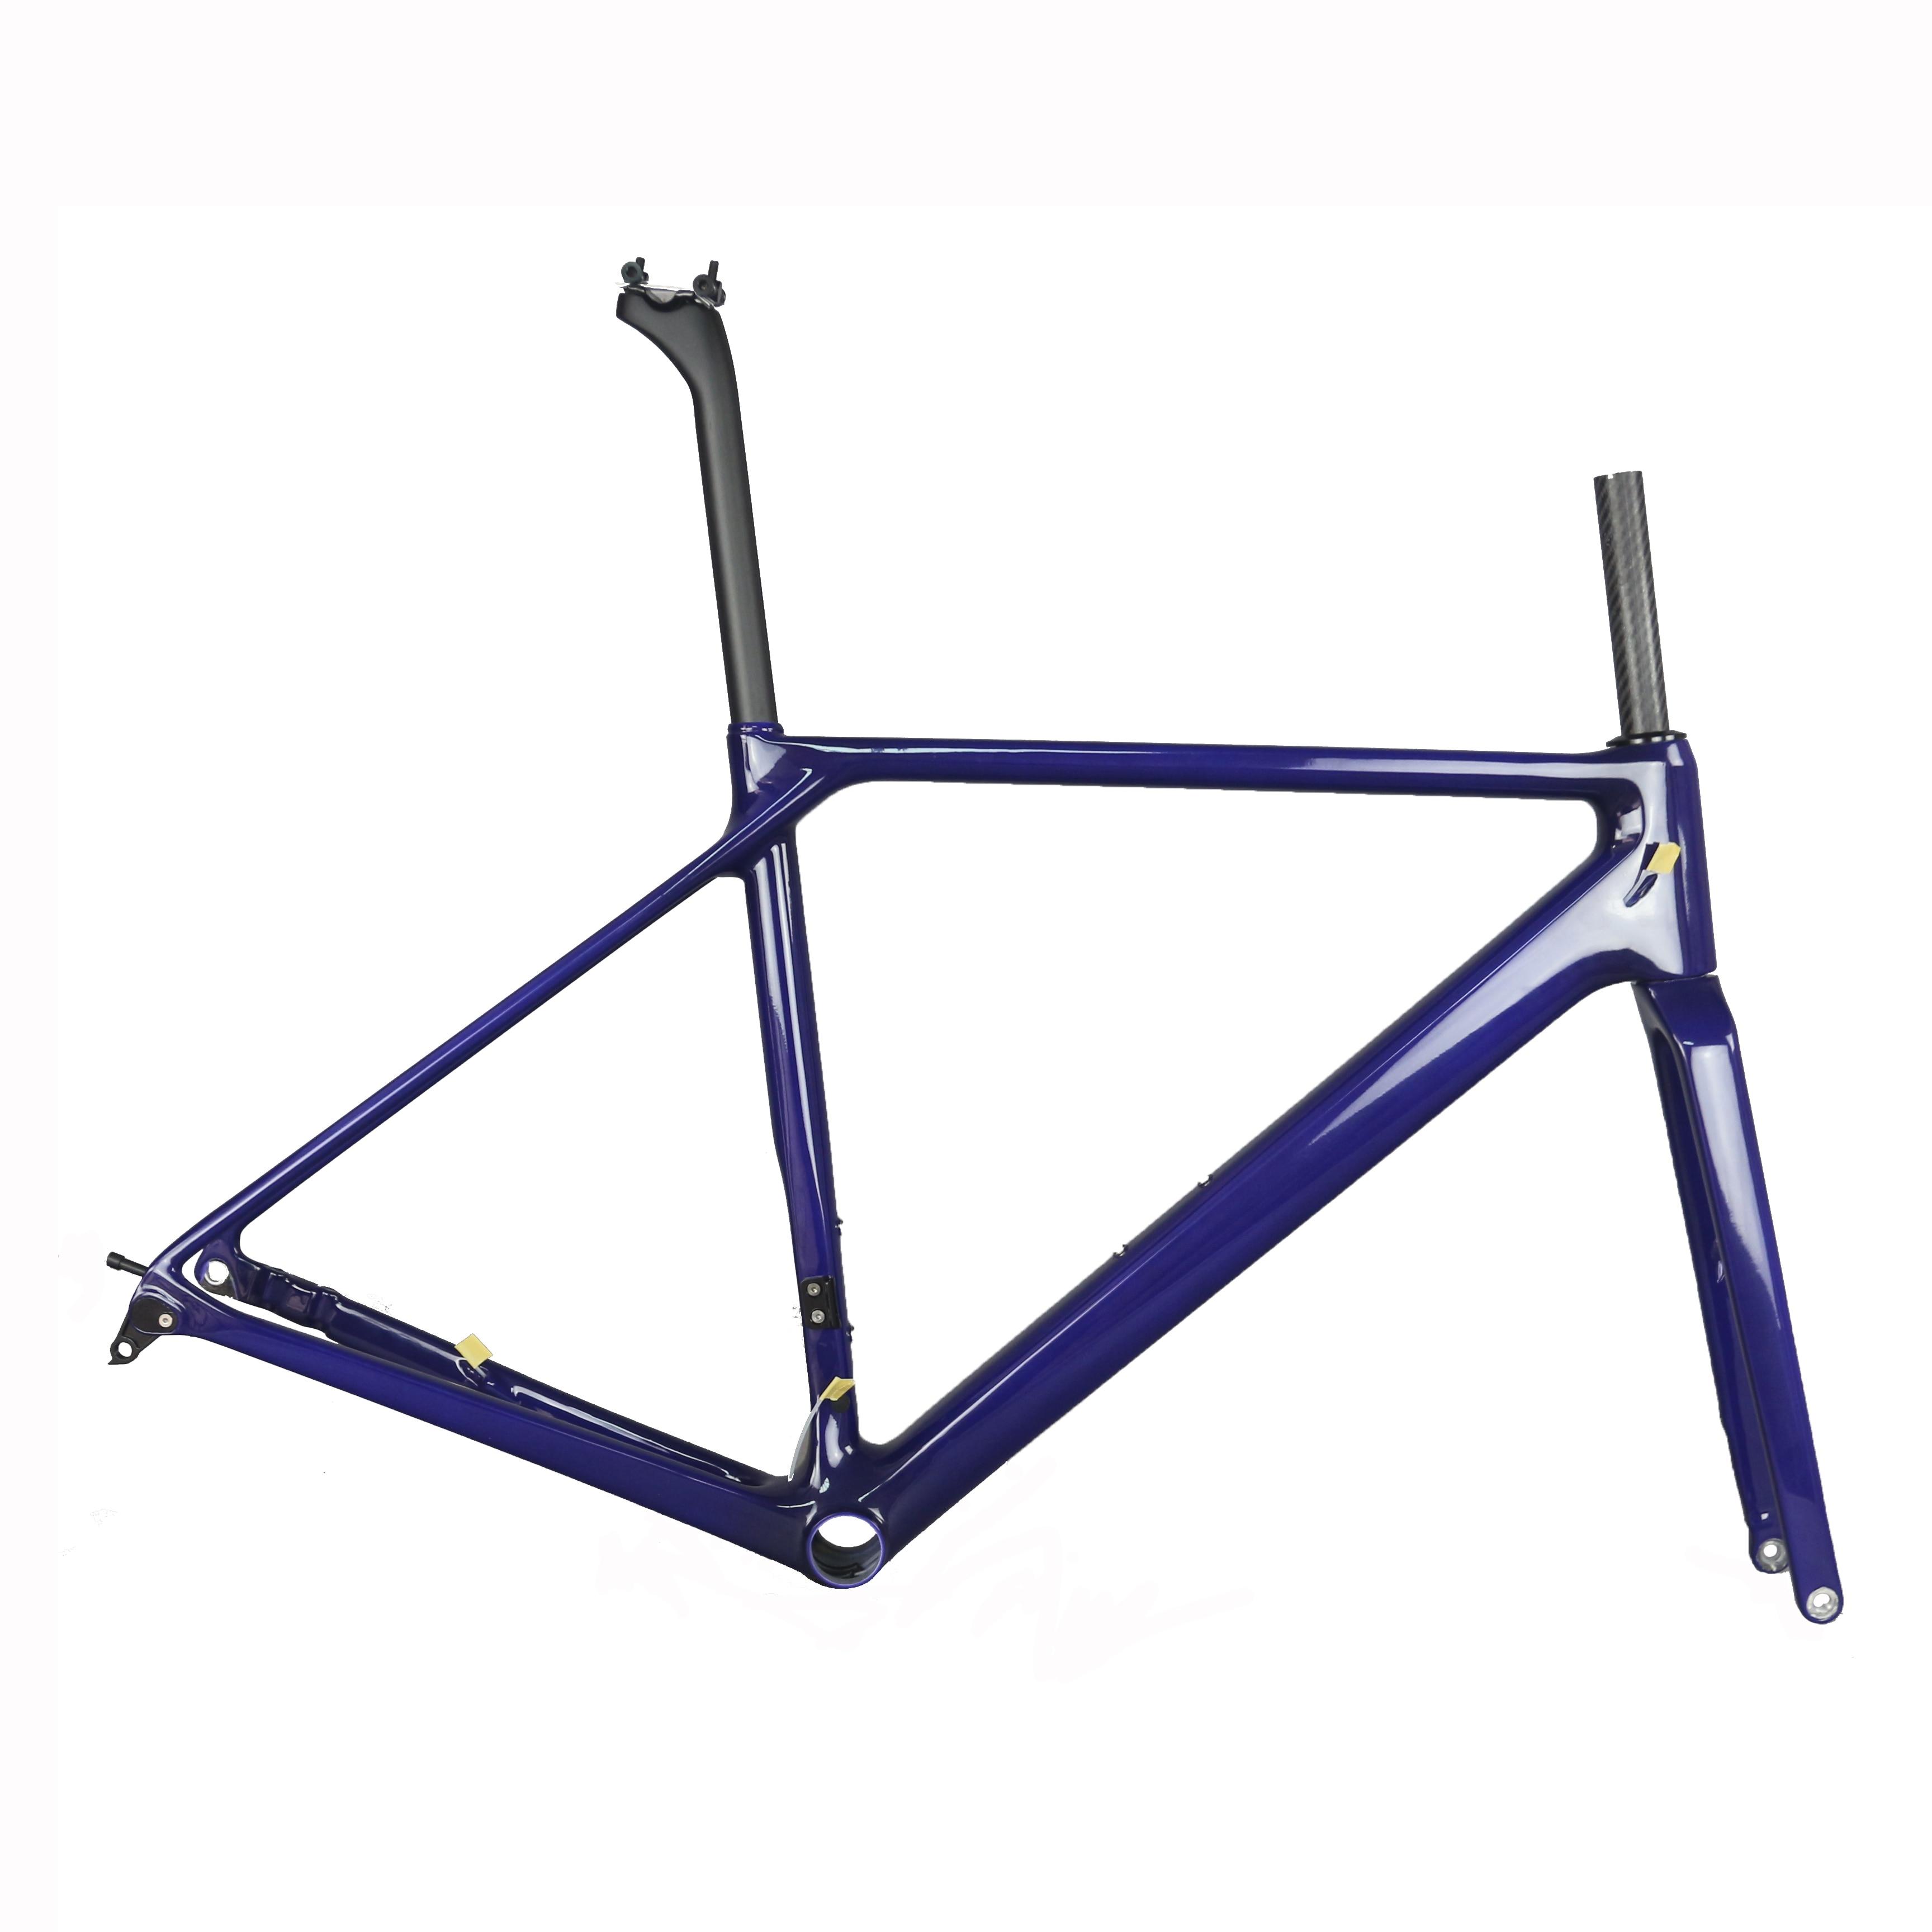 2019 New FM009 Flat Mount Disc Brake Road Bike Frame (new EPS Technology) Di2 Can Be Fixed Frame Custom Paint